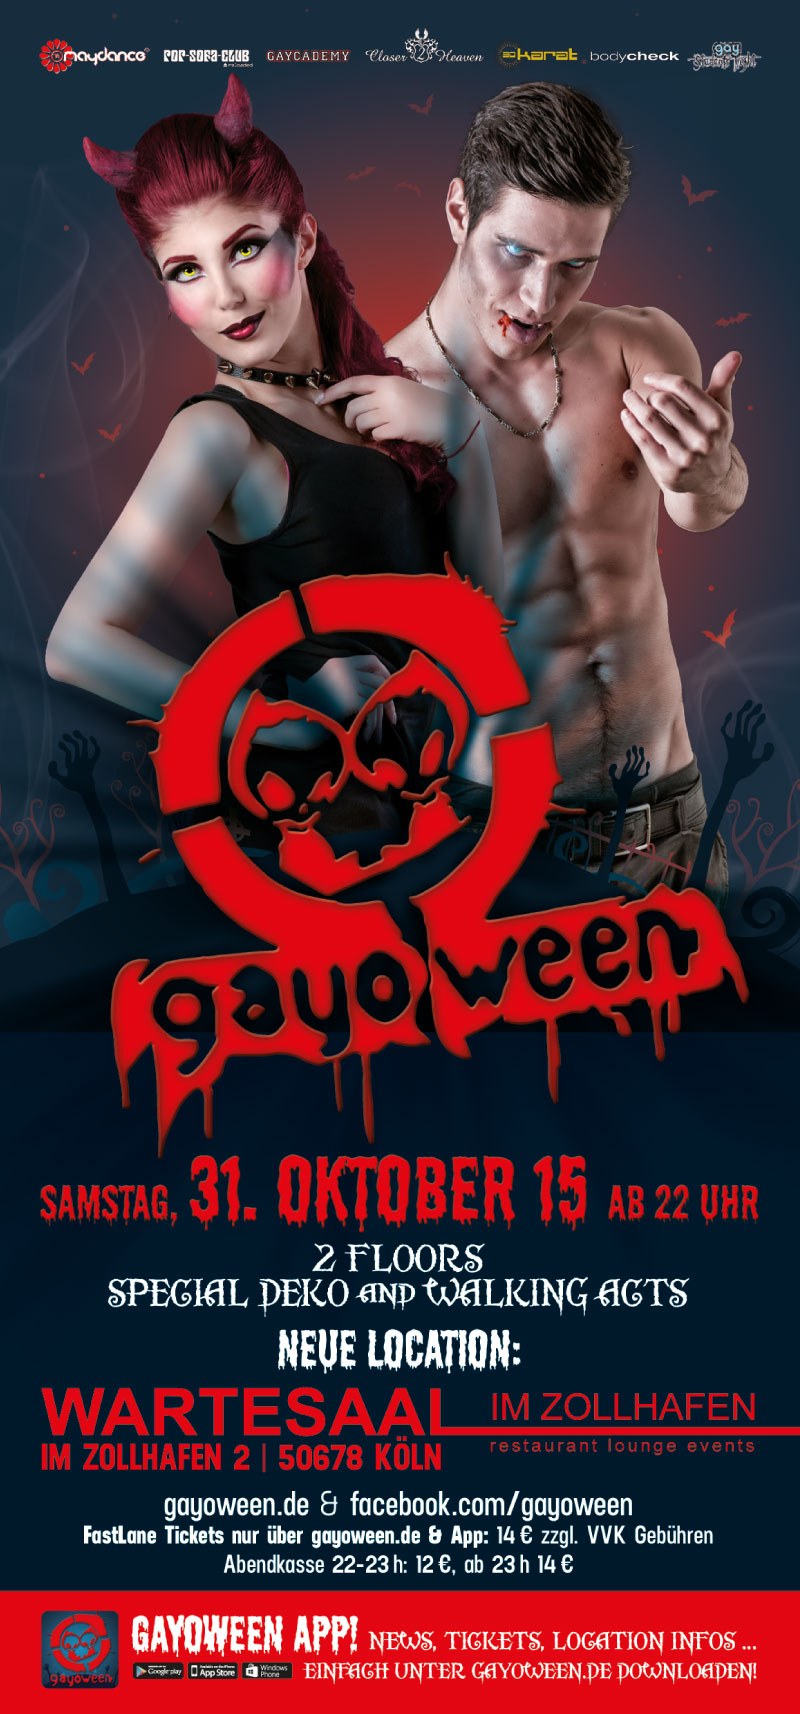 GAYOWEEN 2015 Flyer vorne